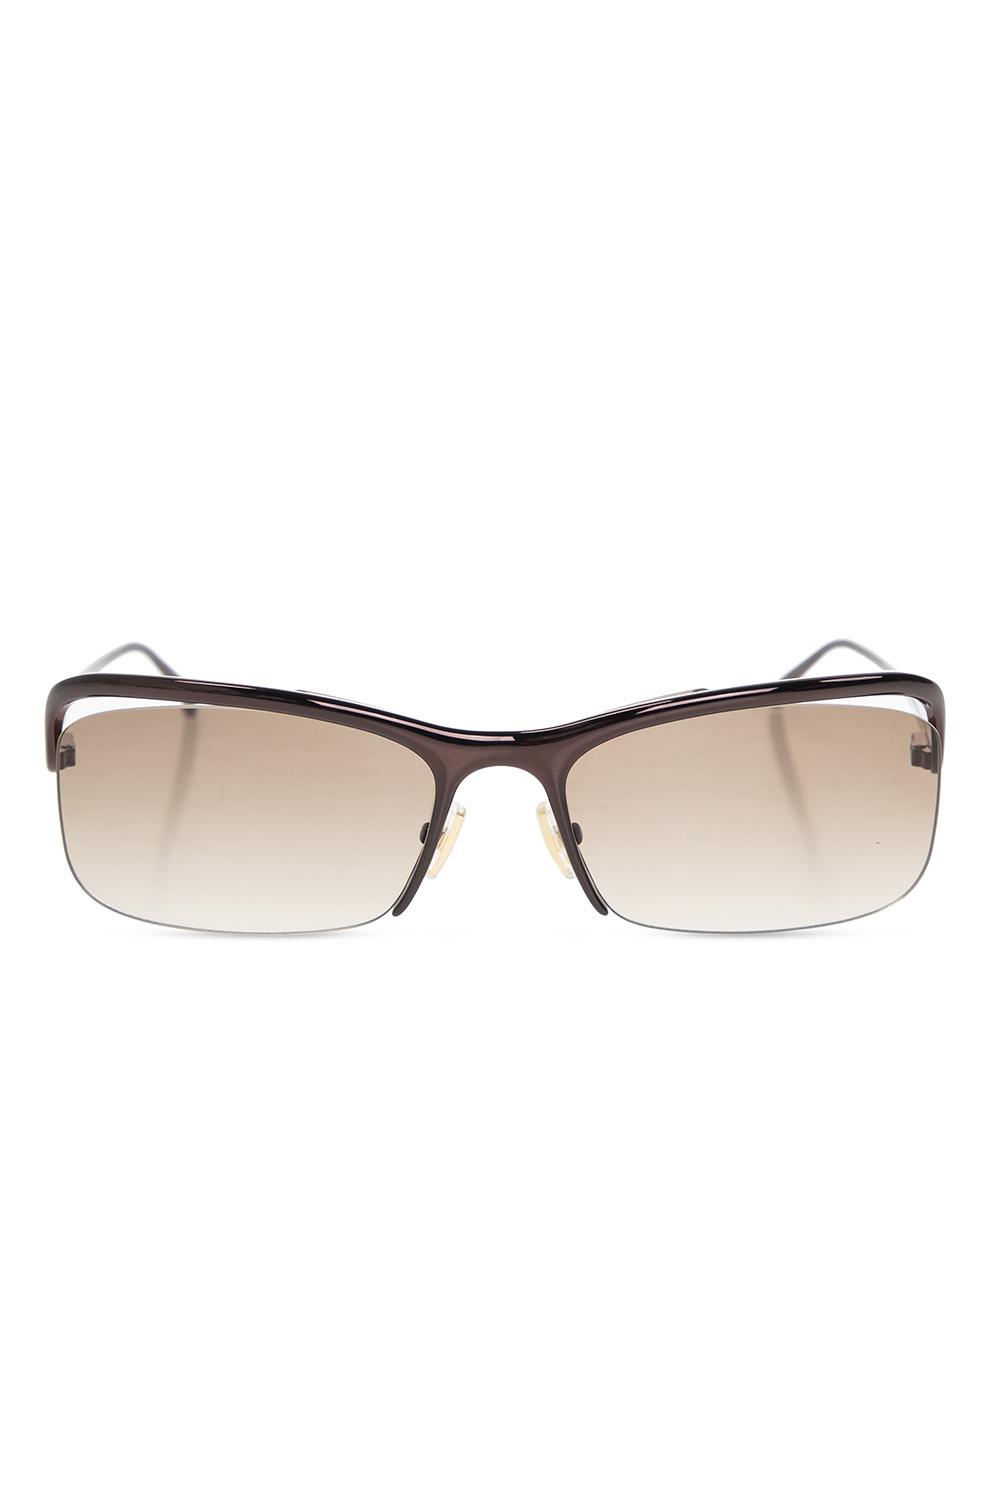 Bottega Veneta Sunglasses with case